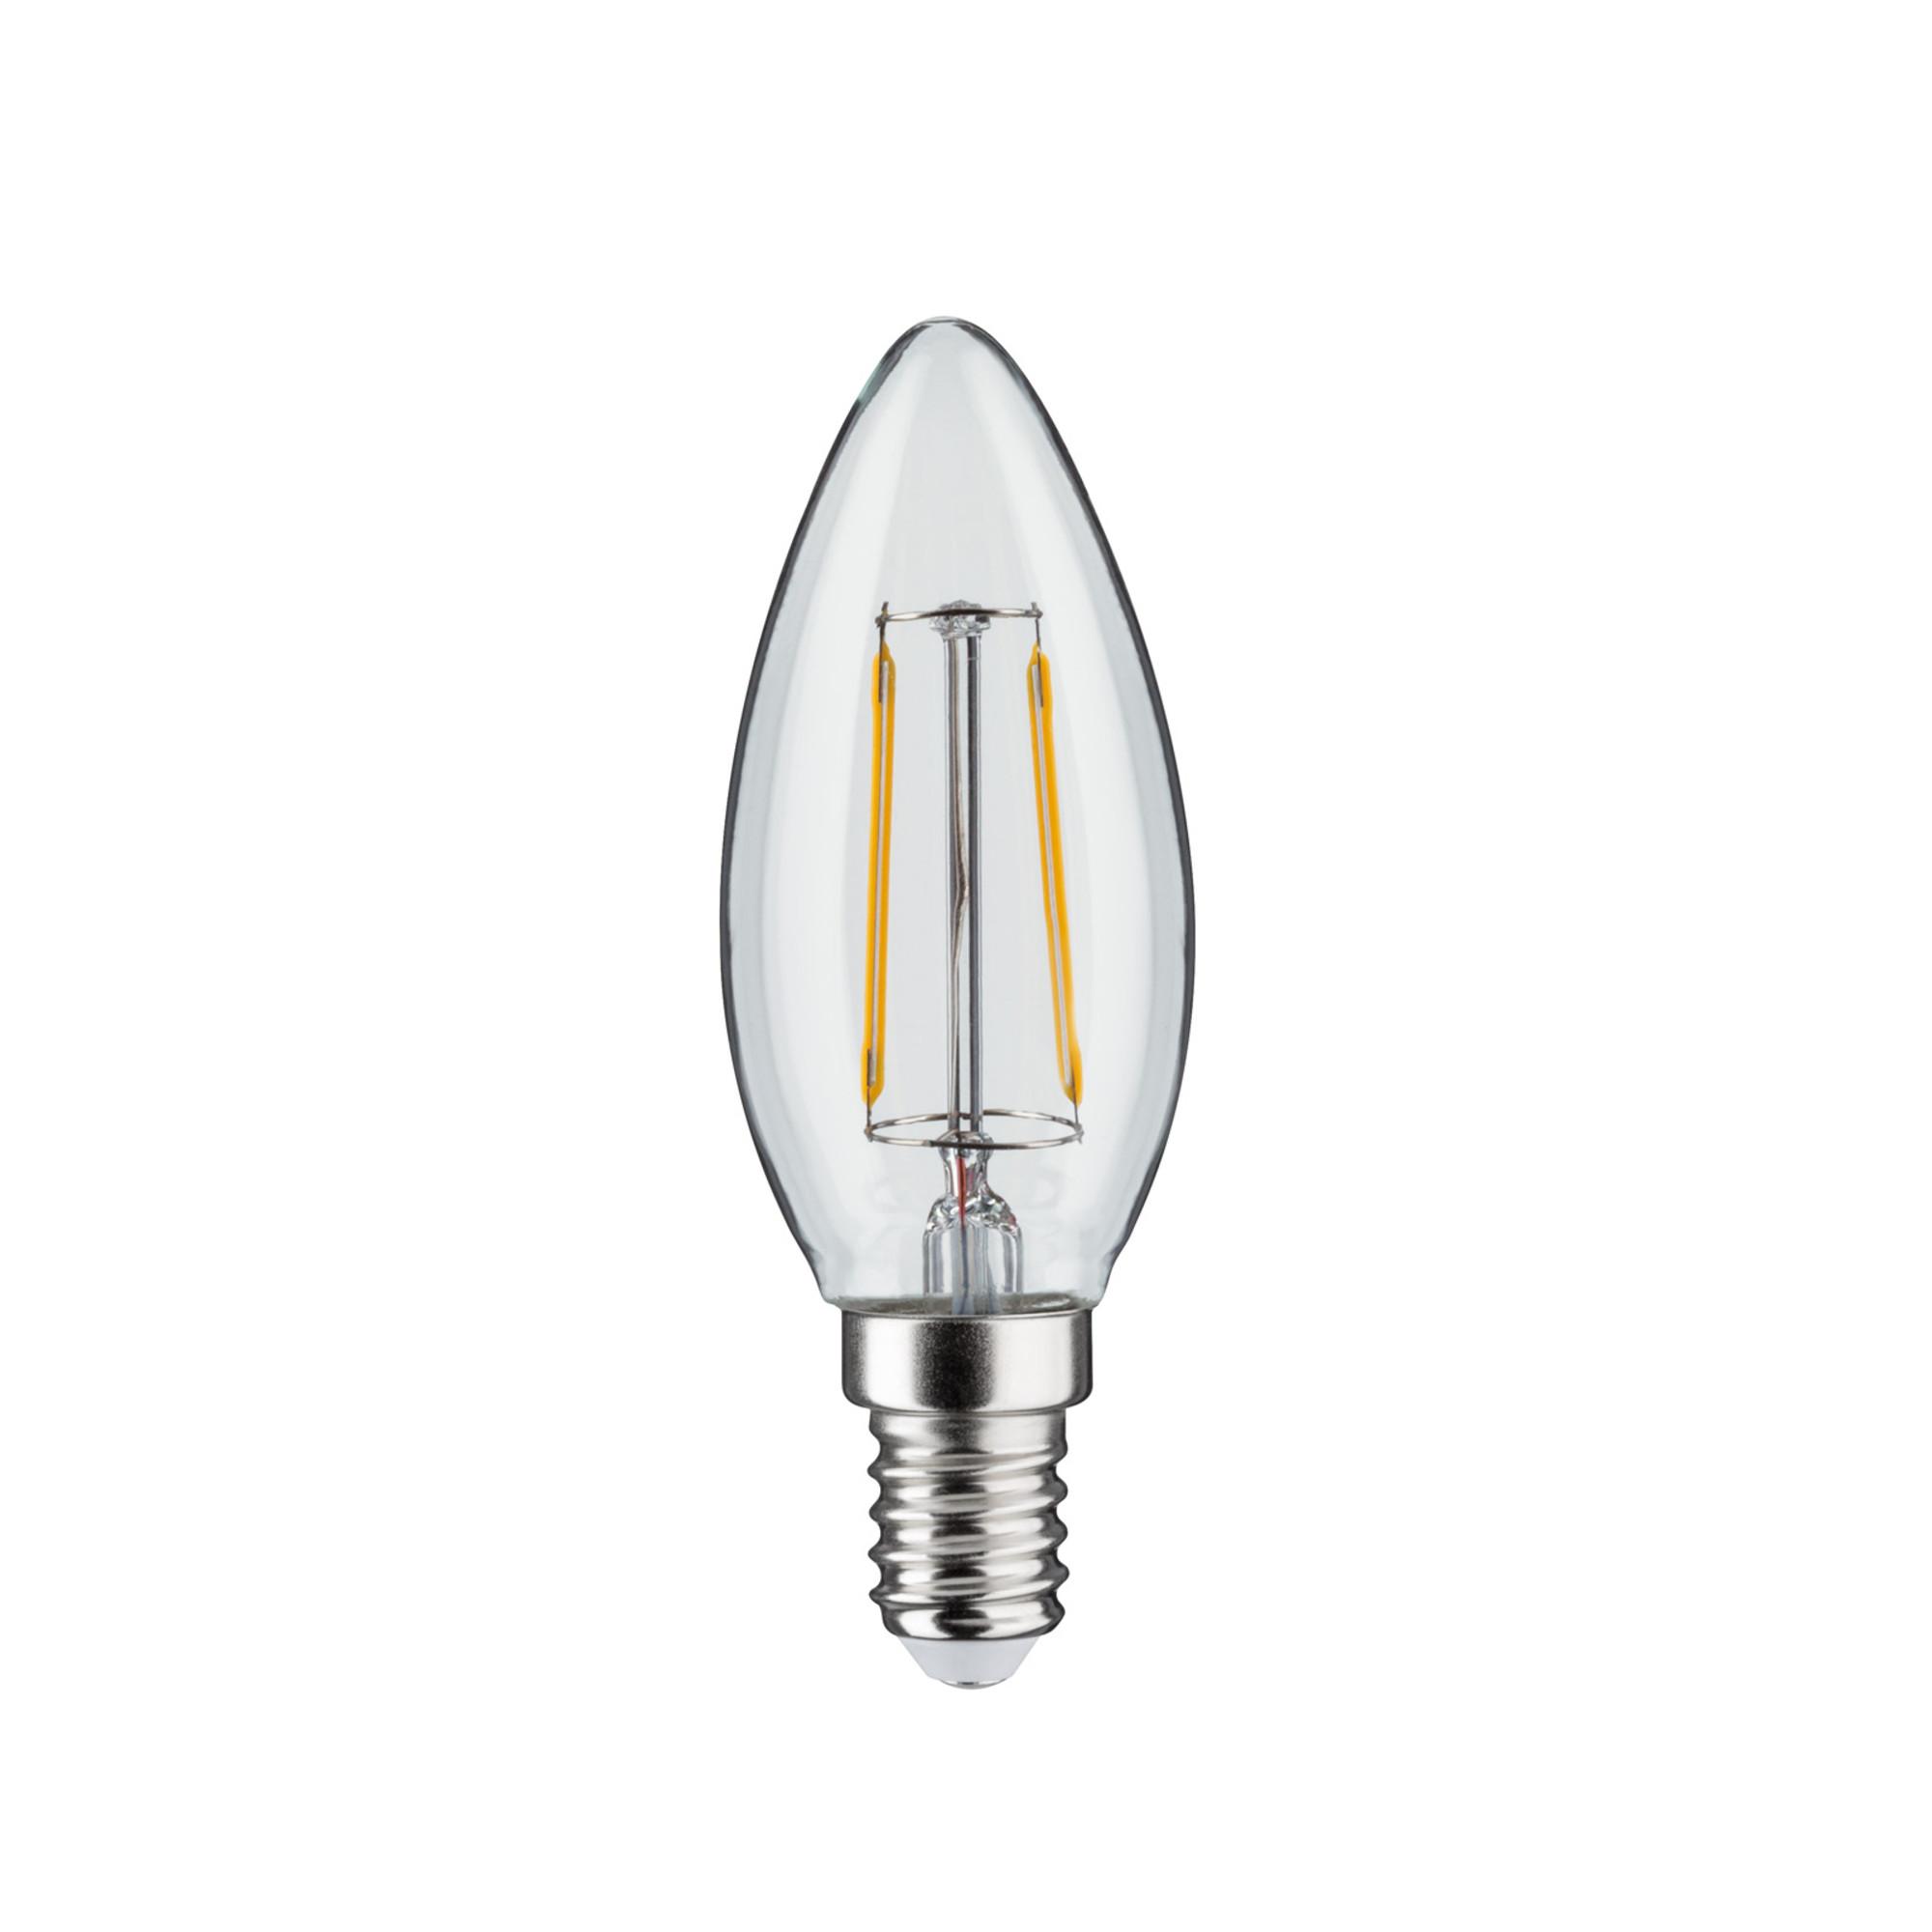 Лампа филаментная Paulmann Свеча 2Вт 250лм 2700К Е14 230В Прозрачный Набор 2 шт. 28474.